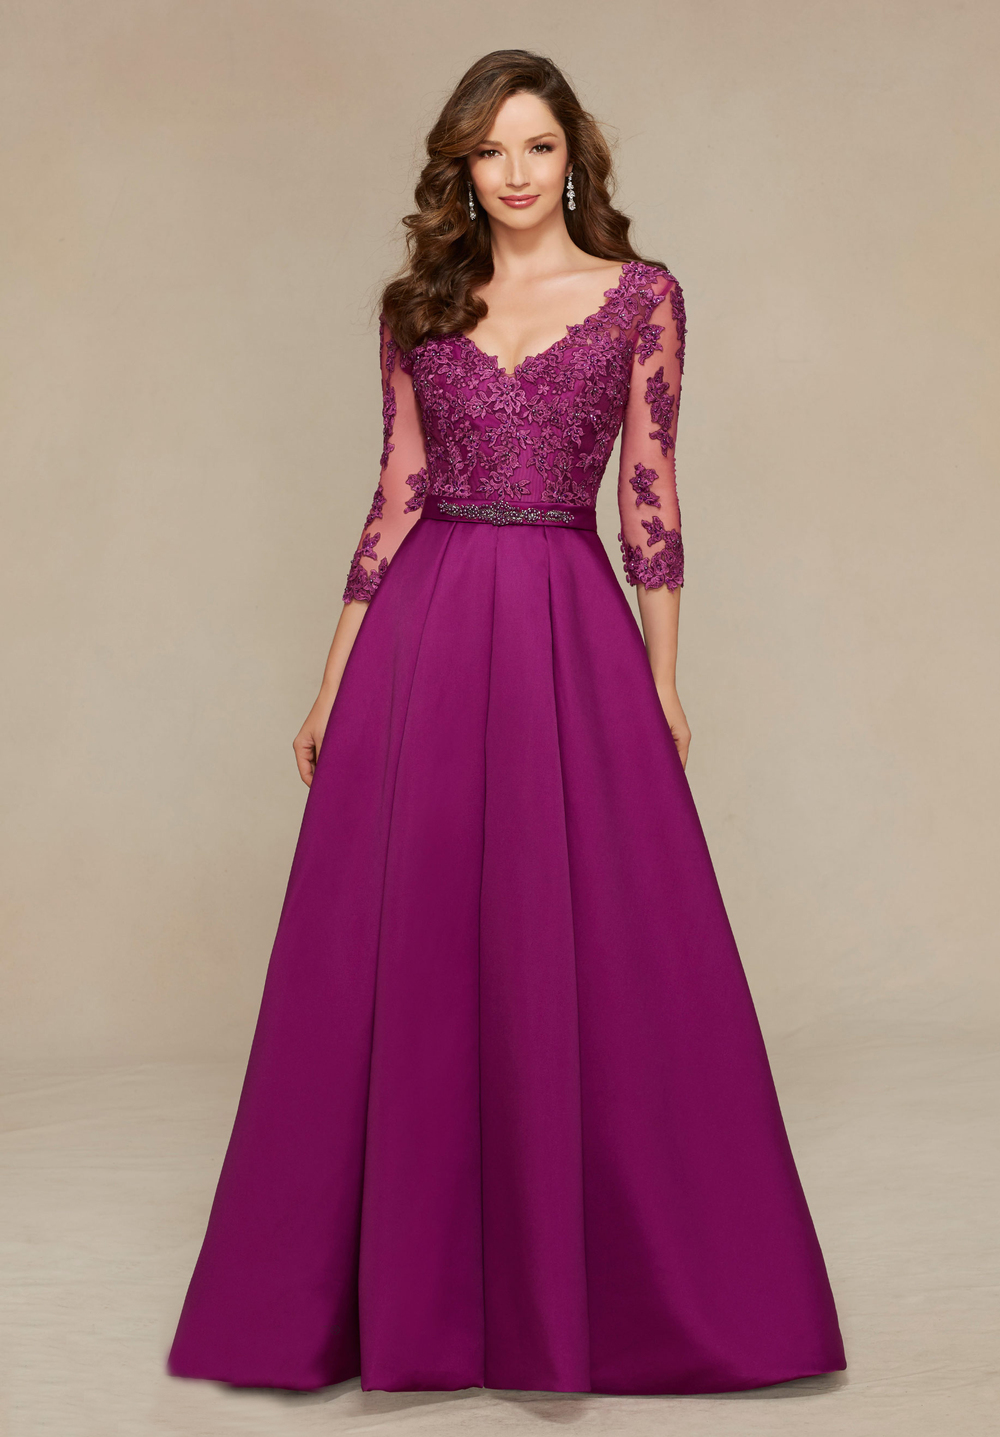 V-Neck Three Quarter Elegant A-Line Purple Long Mother of the Bride Dress 1